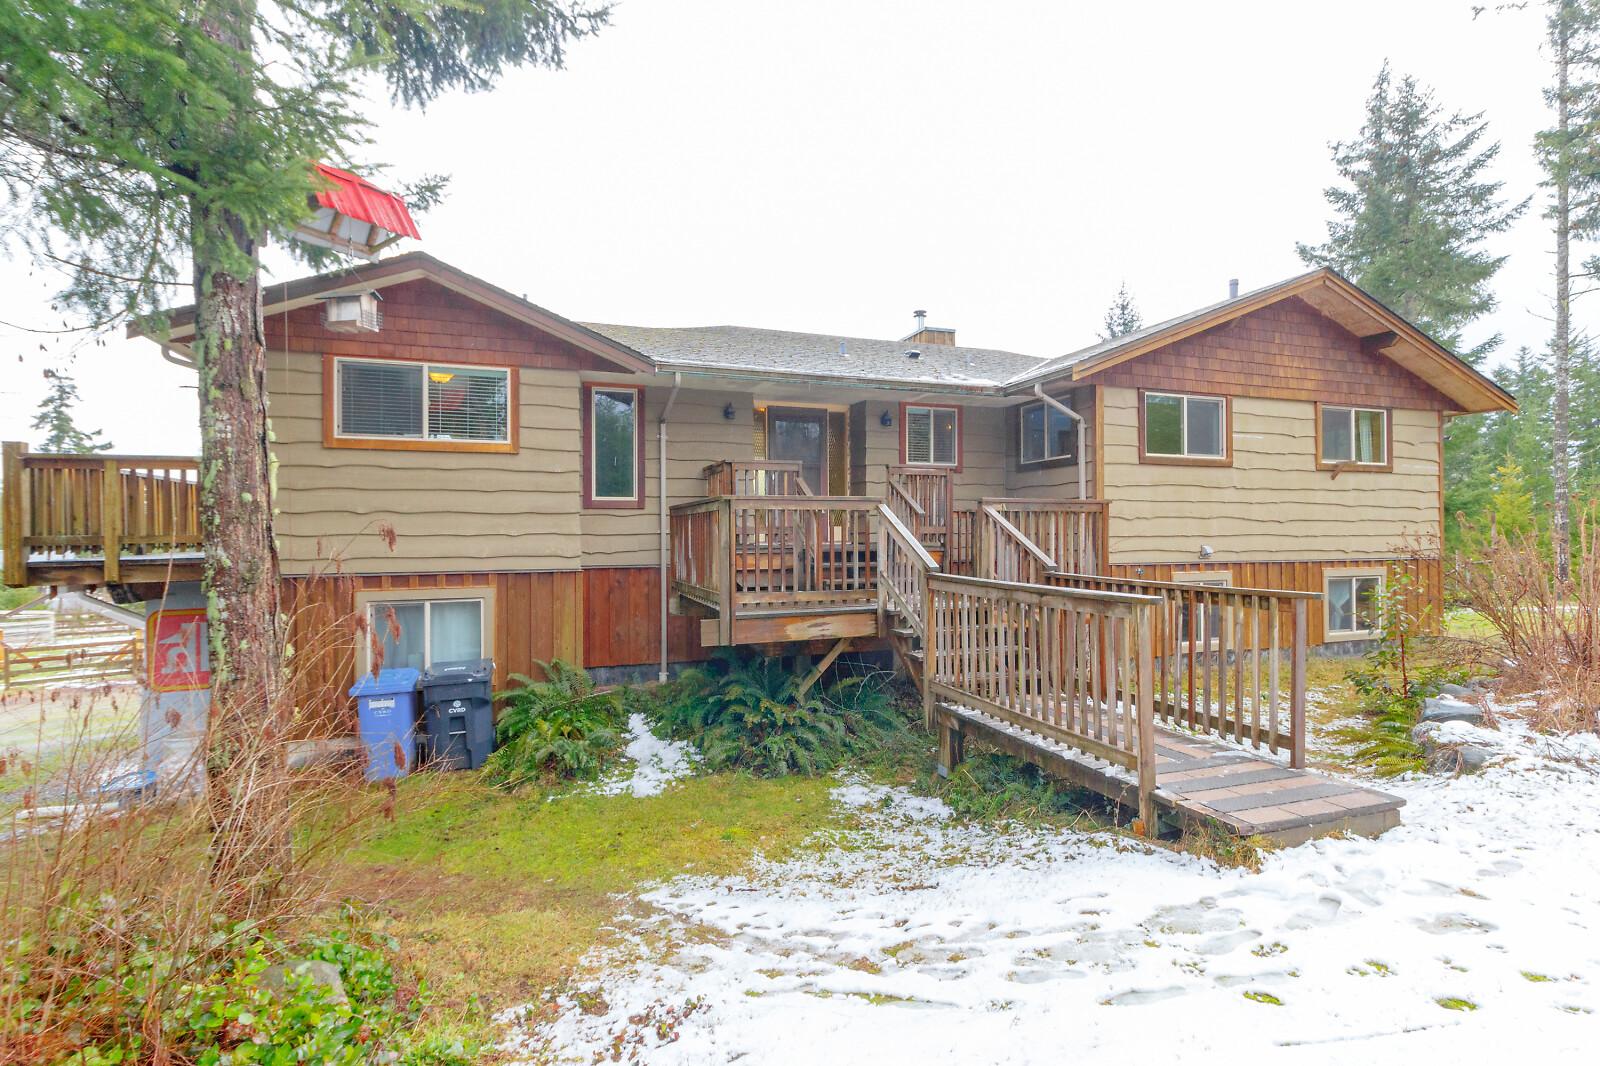 5886 Kapoor Rd, Duncan, British Columbia  V9L 6H6 - Photo 3 - 863802